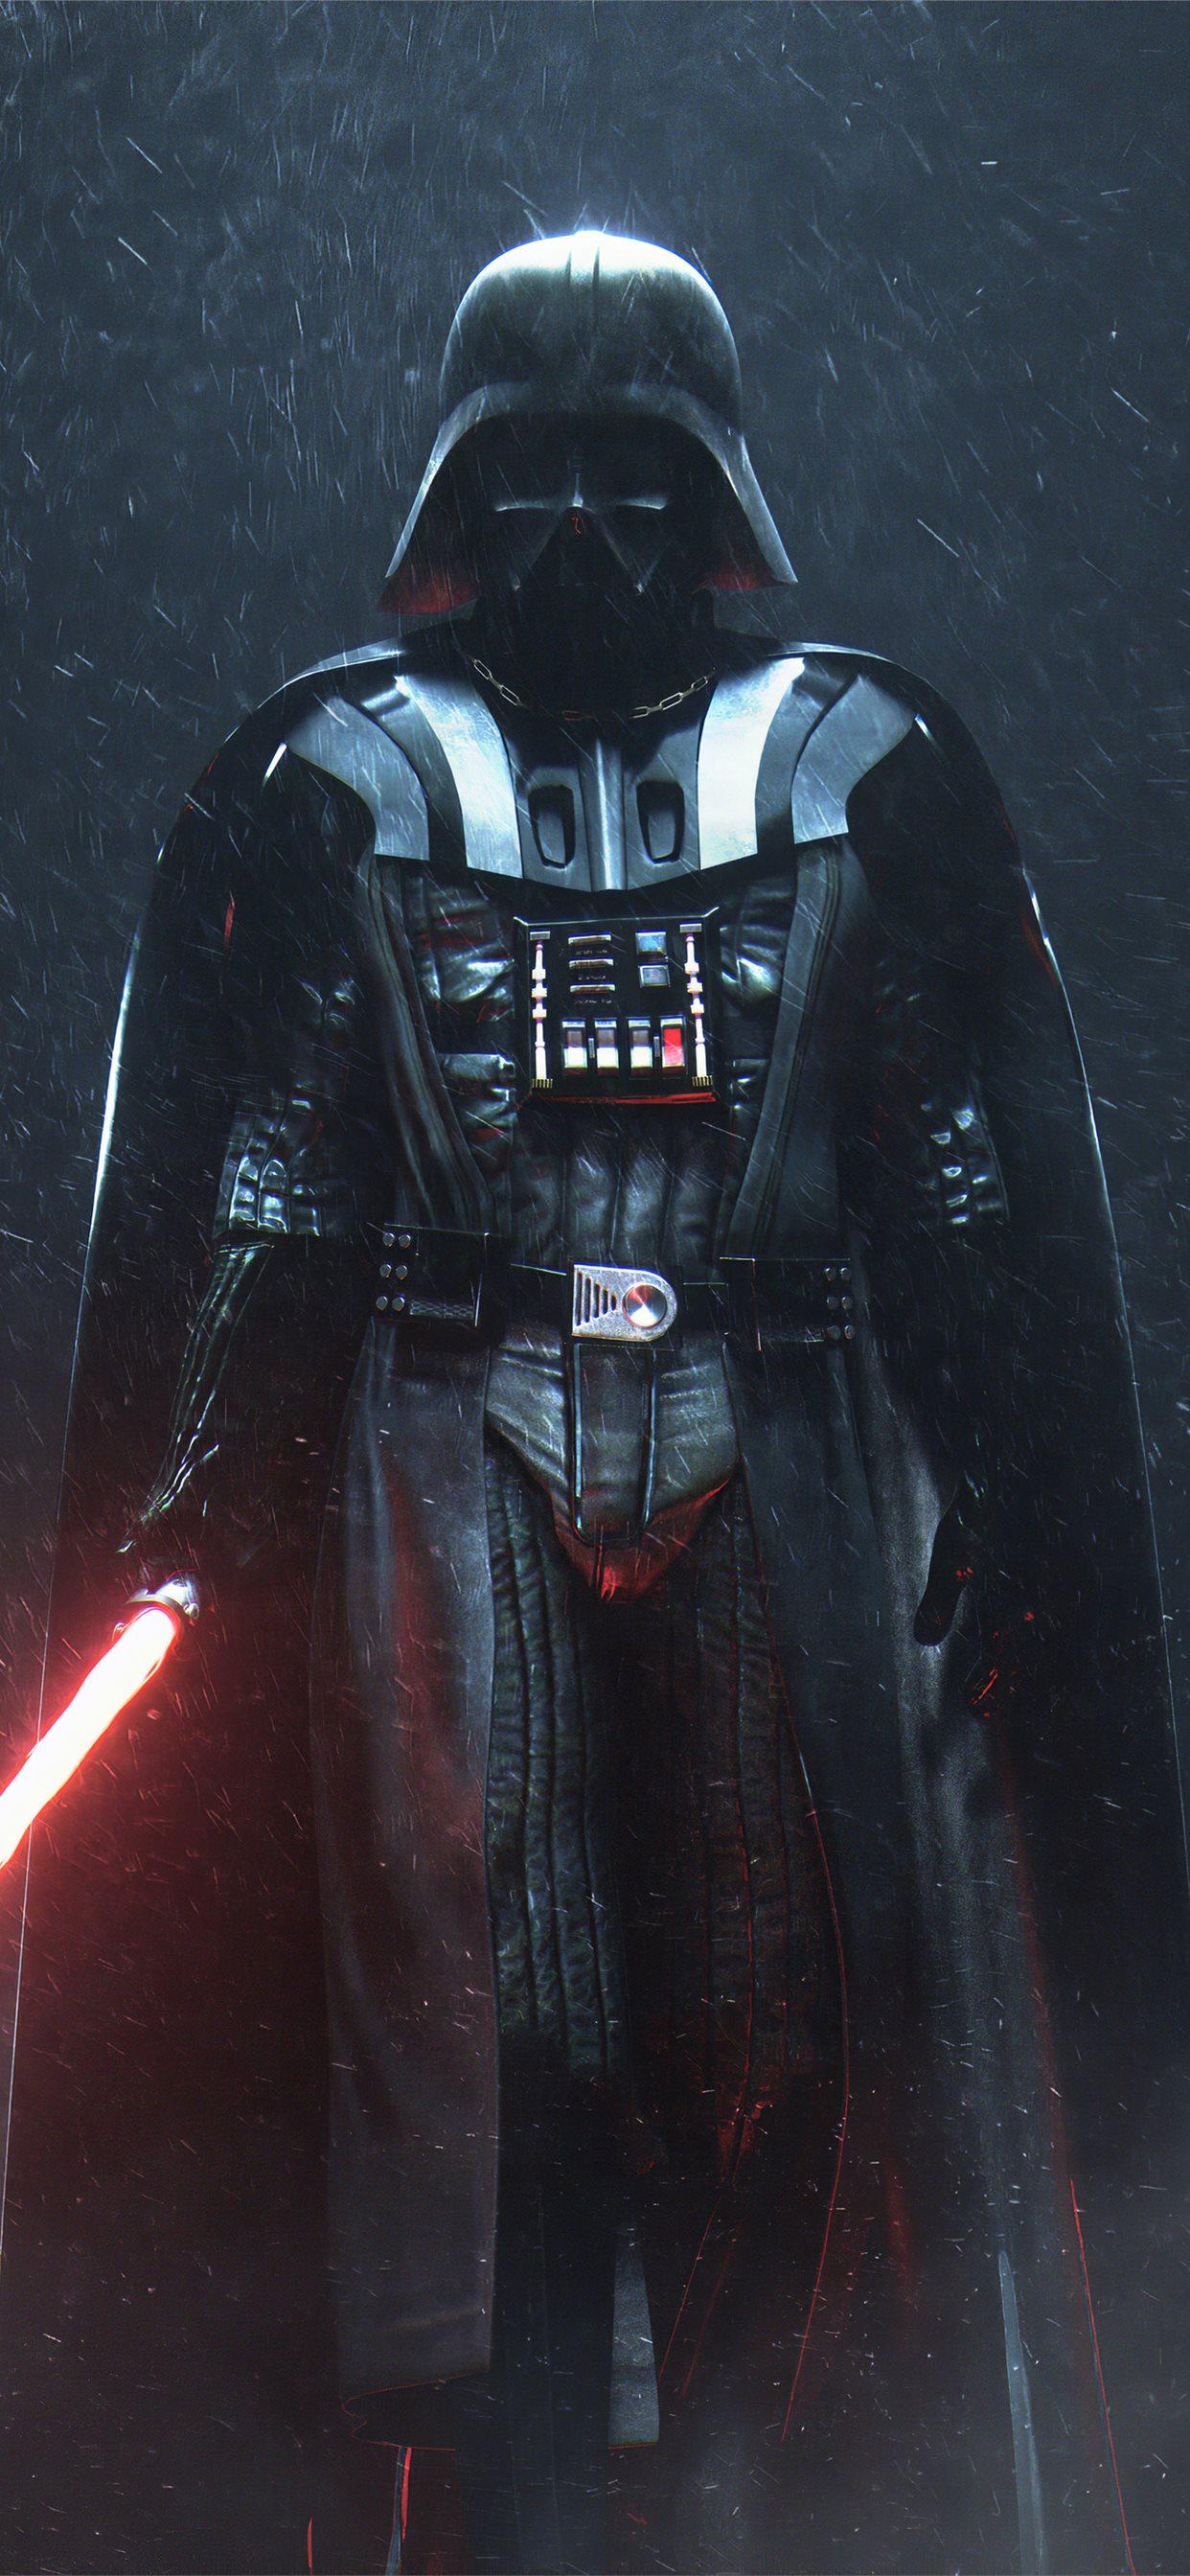 Darth Vader 2020 4k Iphone X Wallpapers Free Download